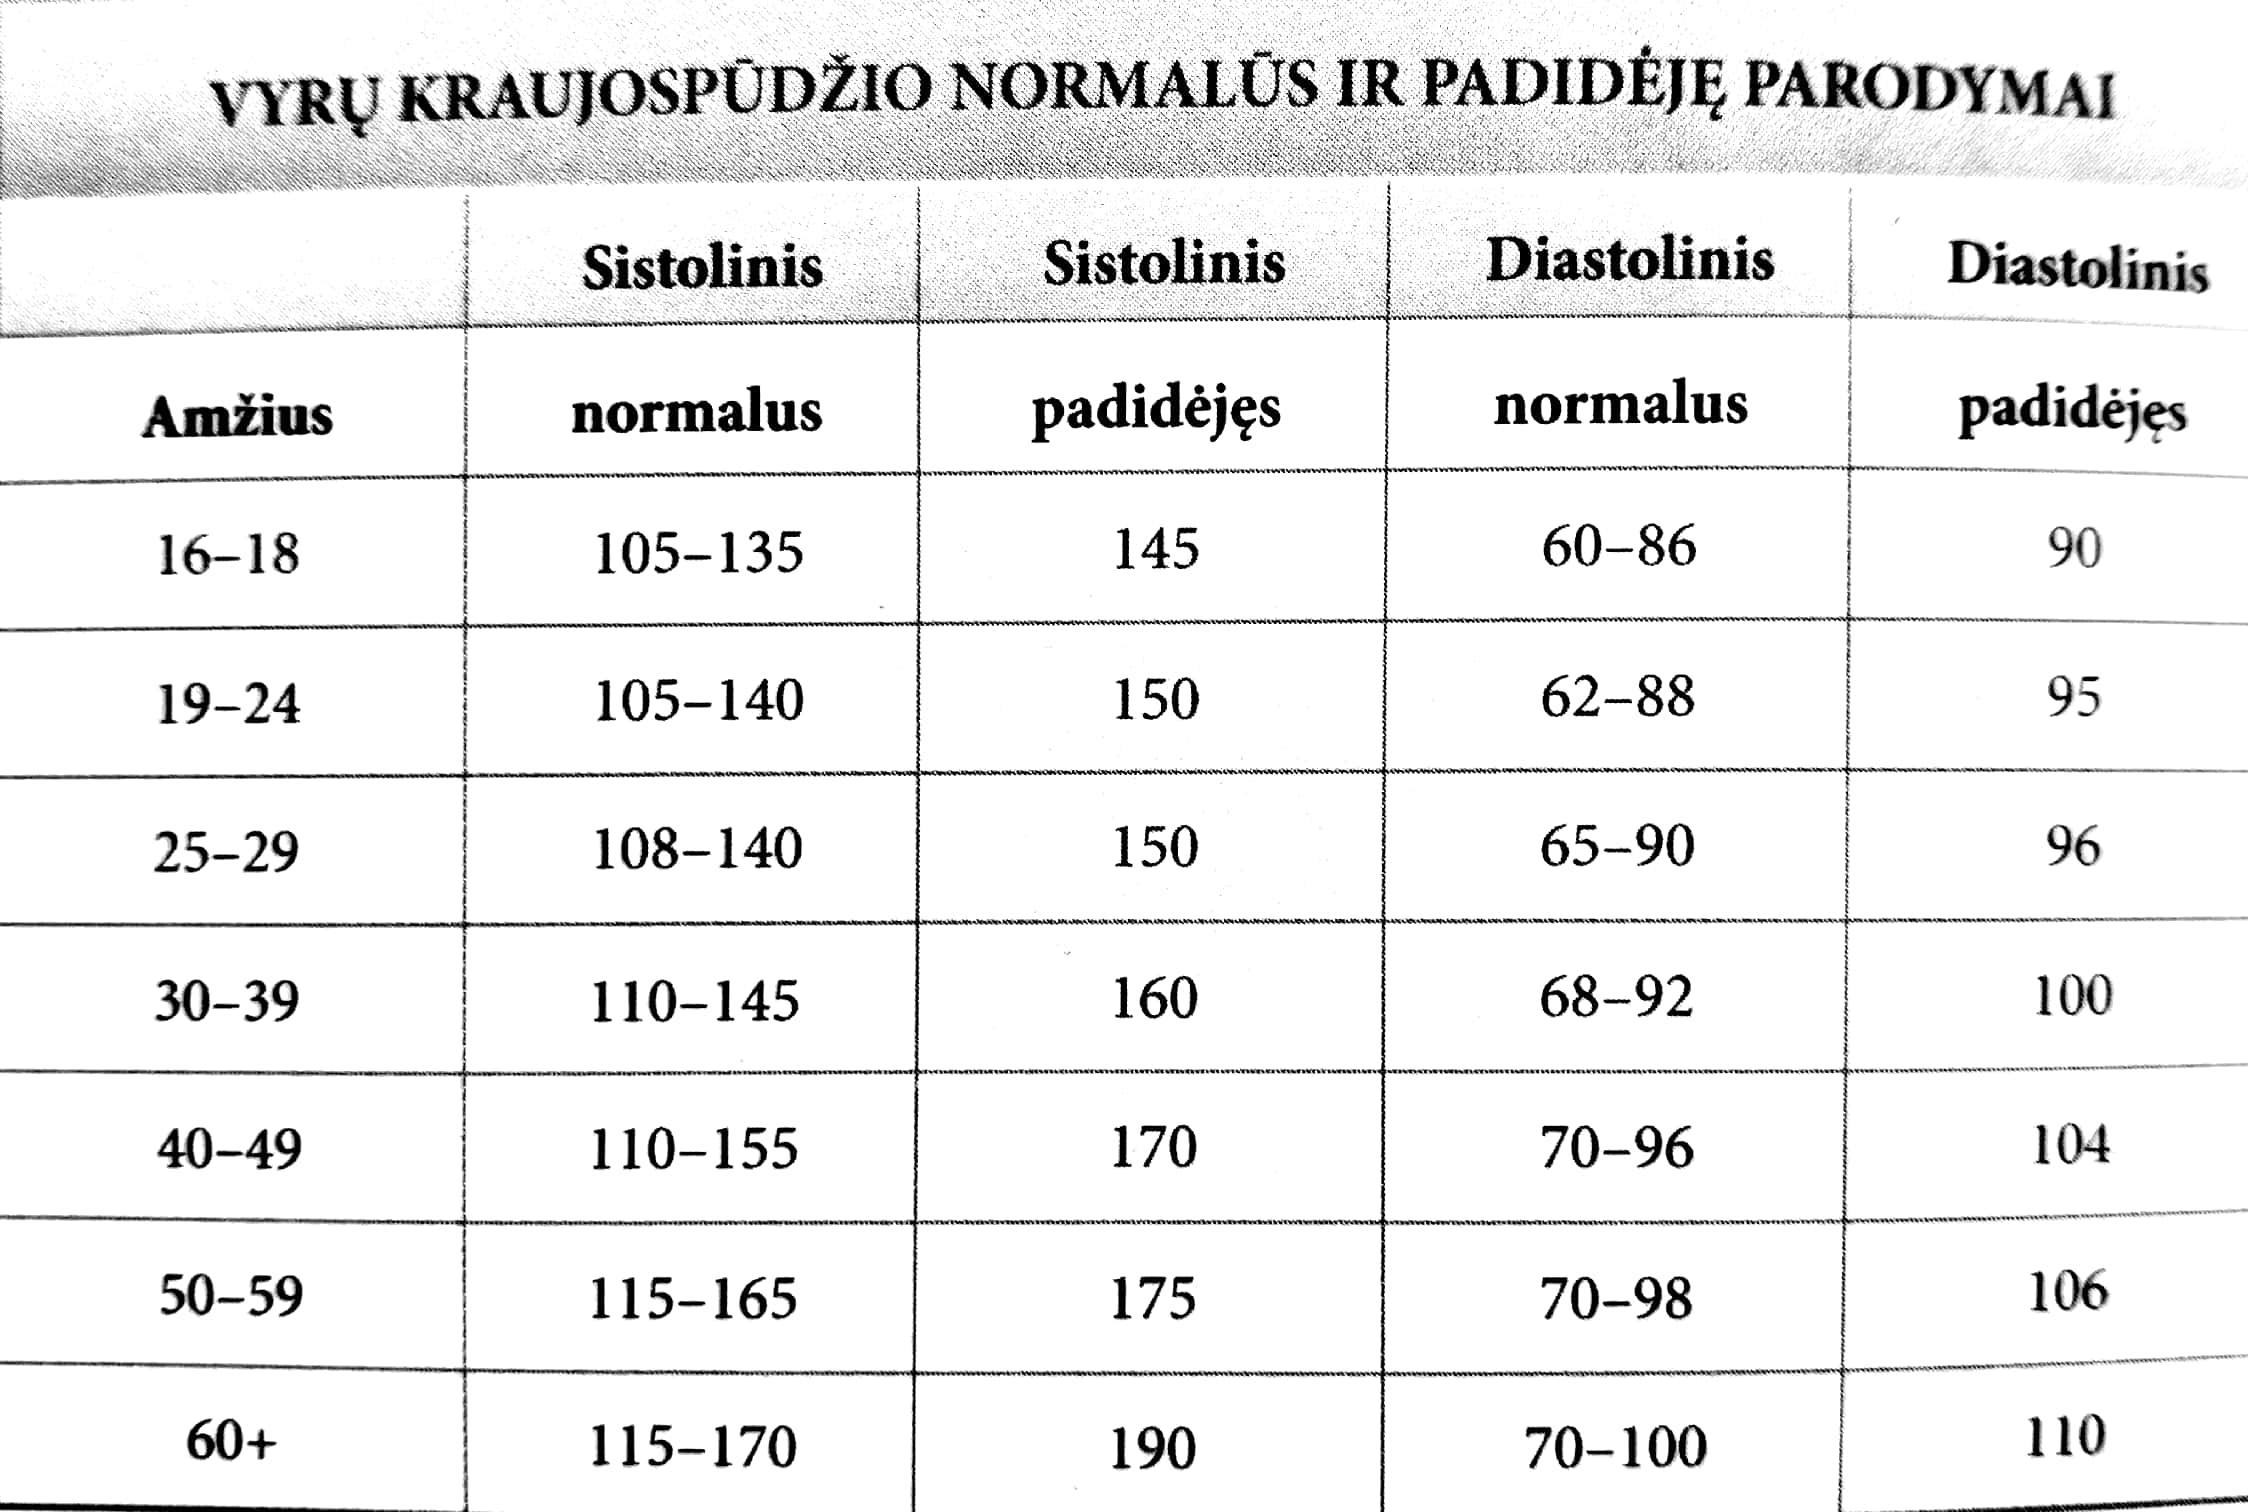 hipertenzija kraujagyslių vaistams